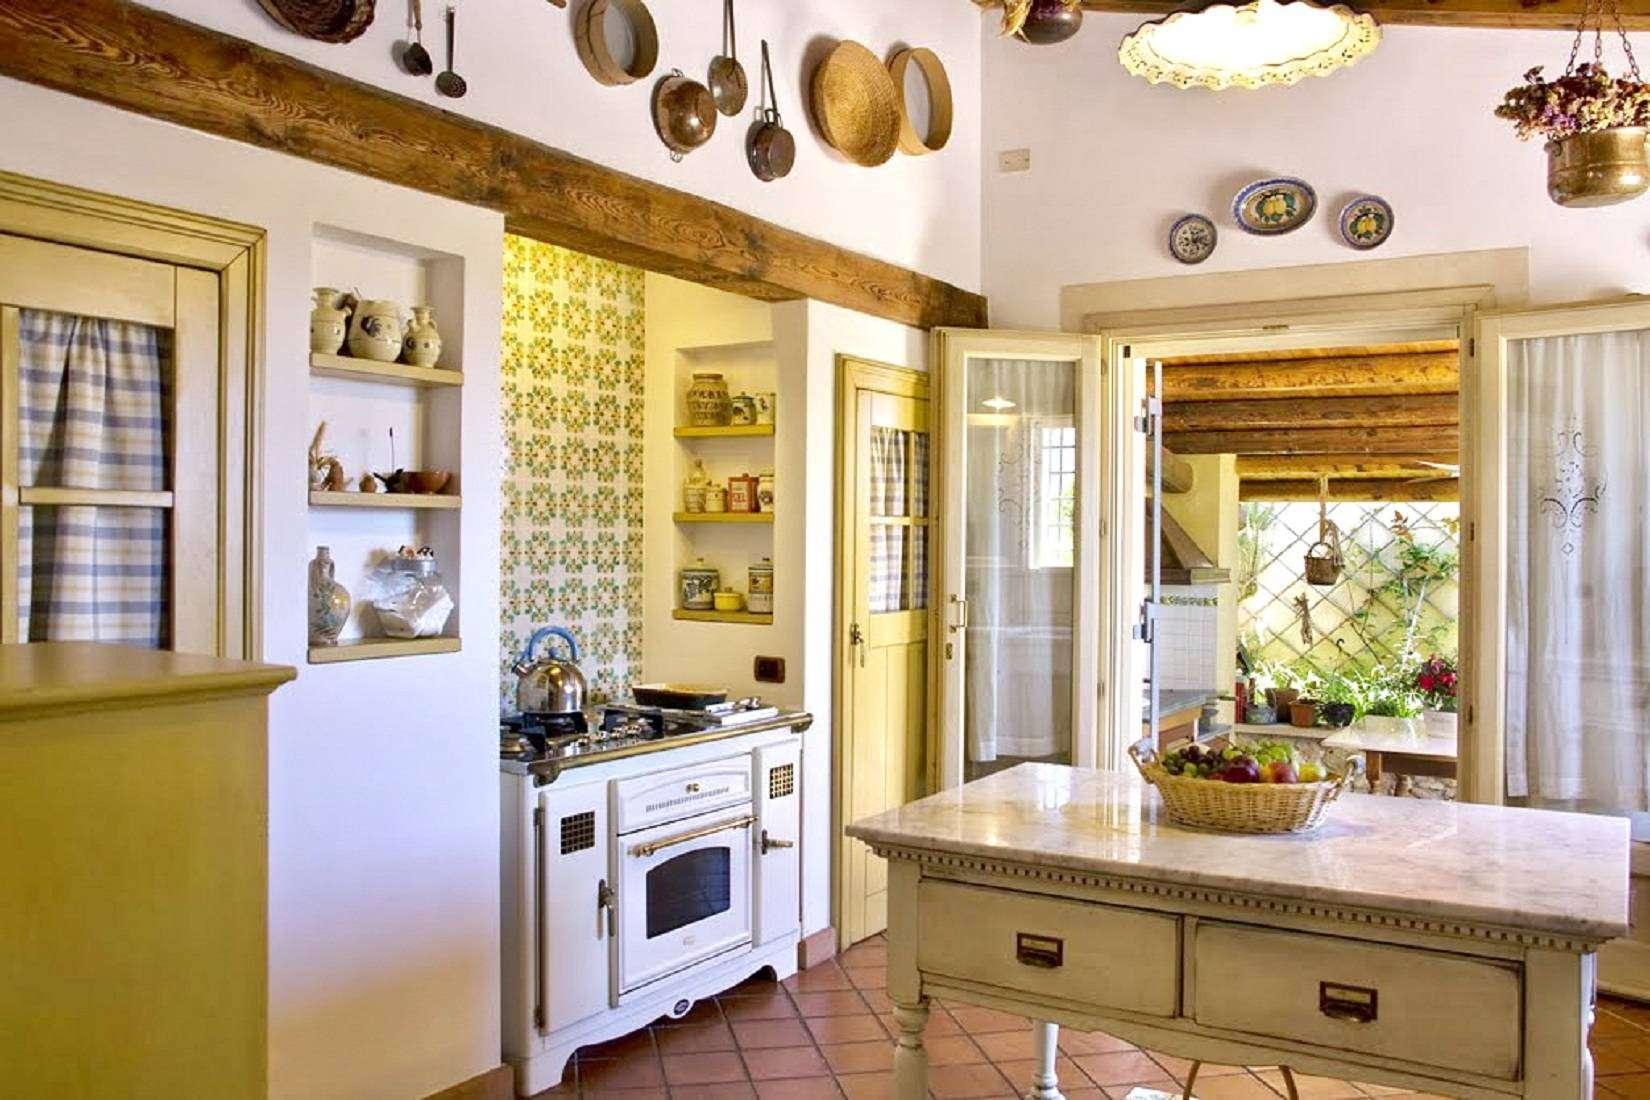 8 Lucia Kitchen